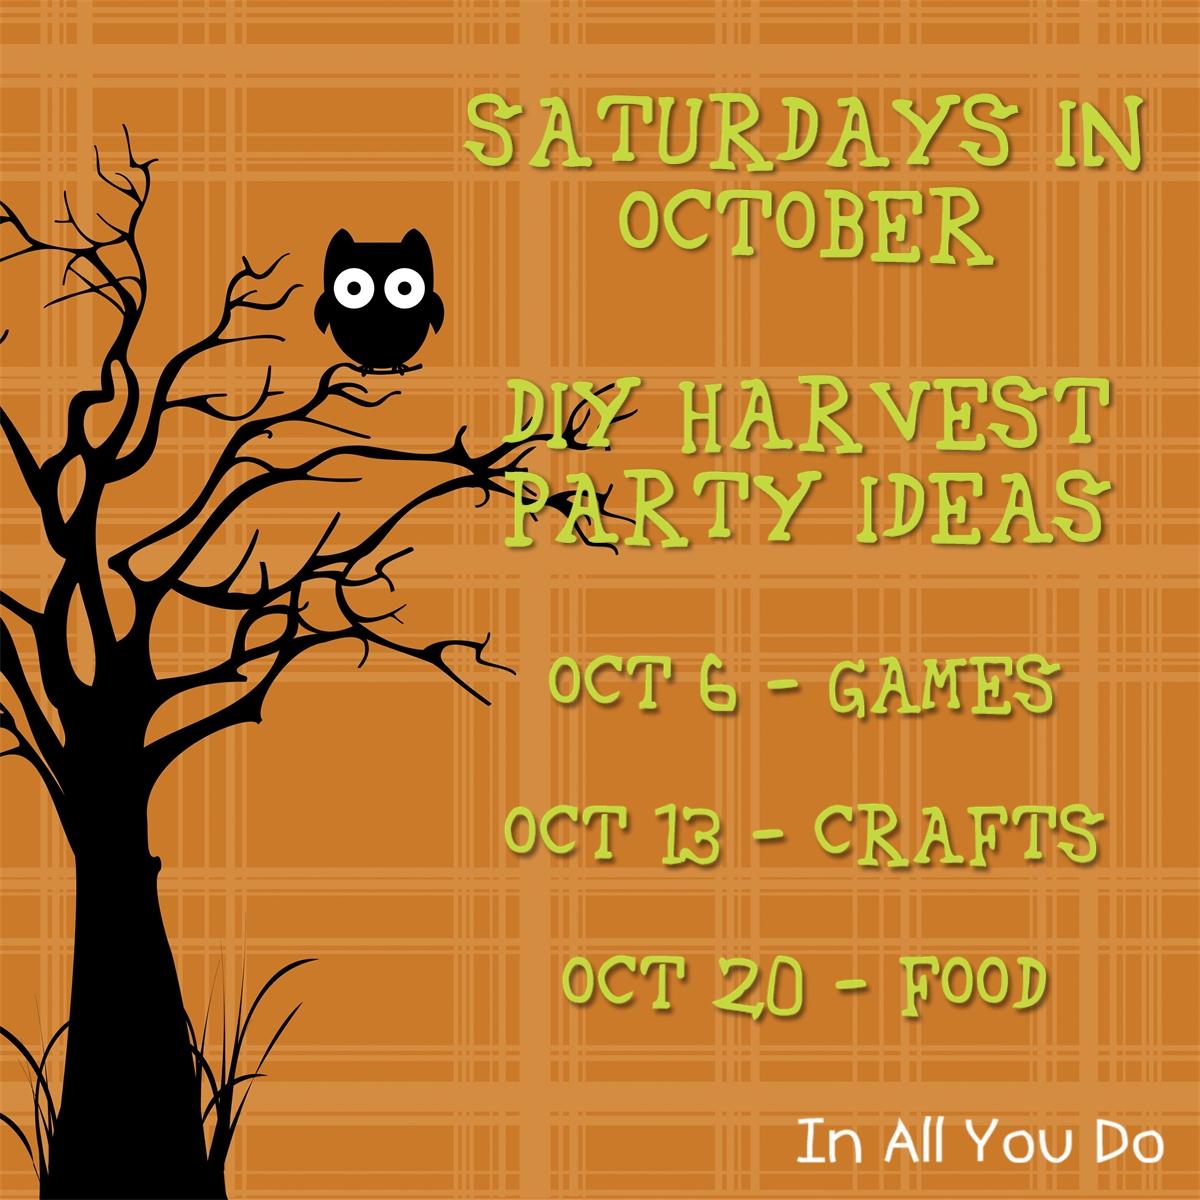 DIY Harvest Party Ideas